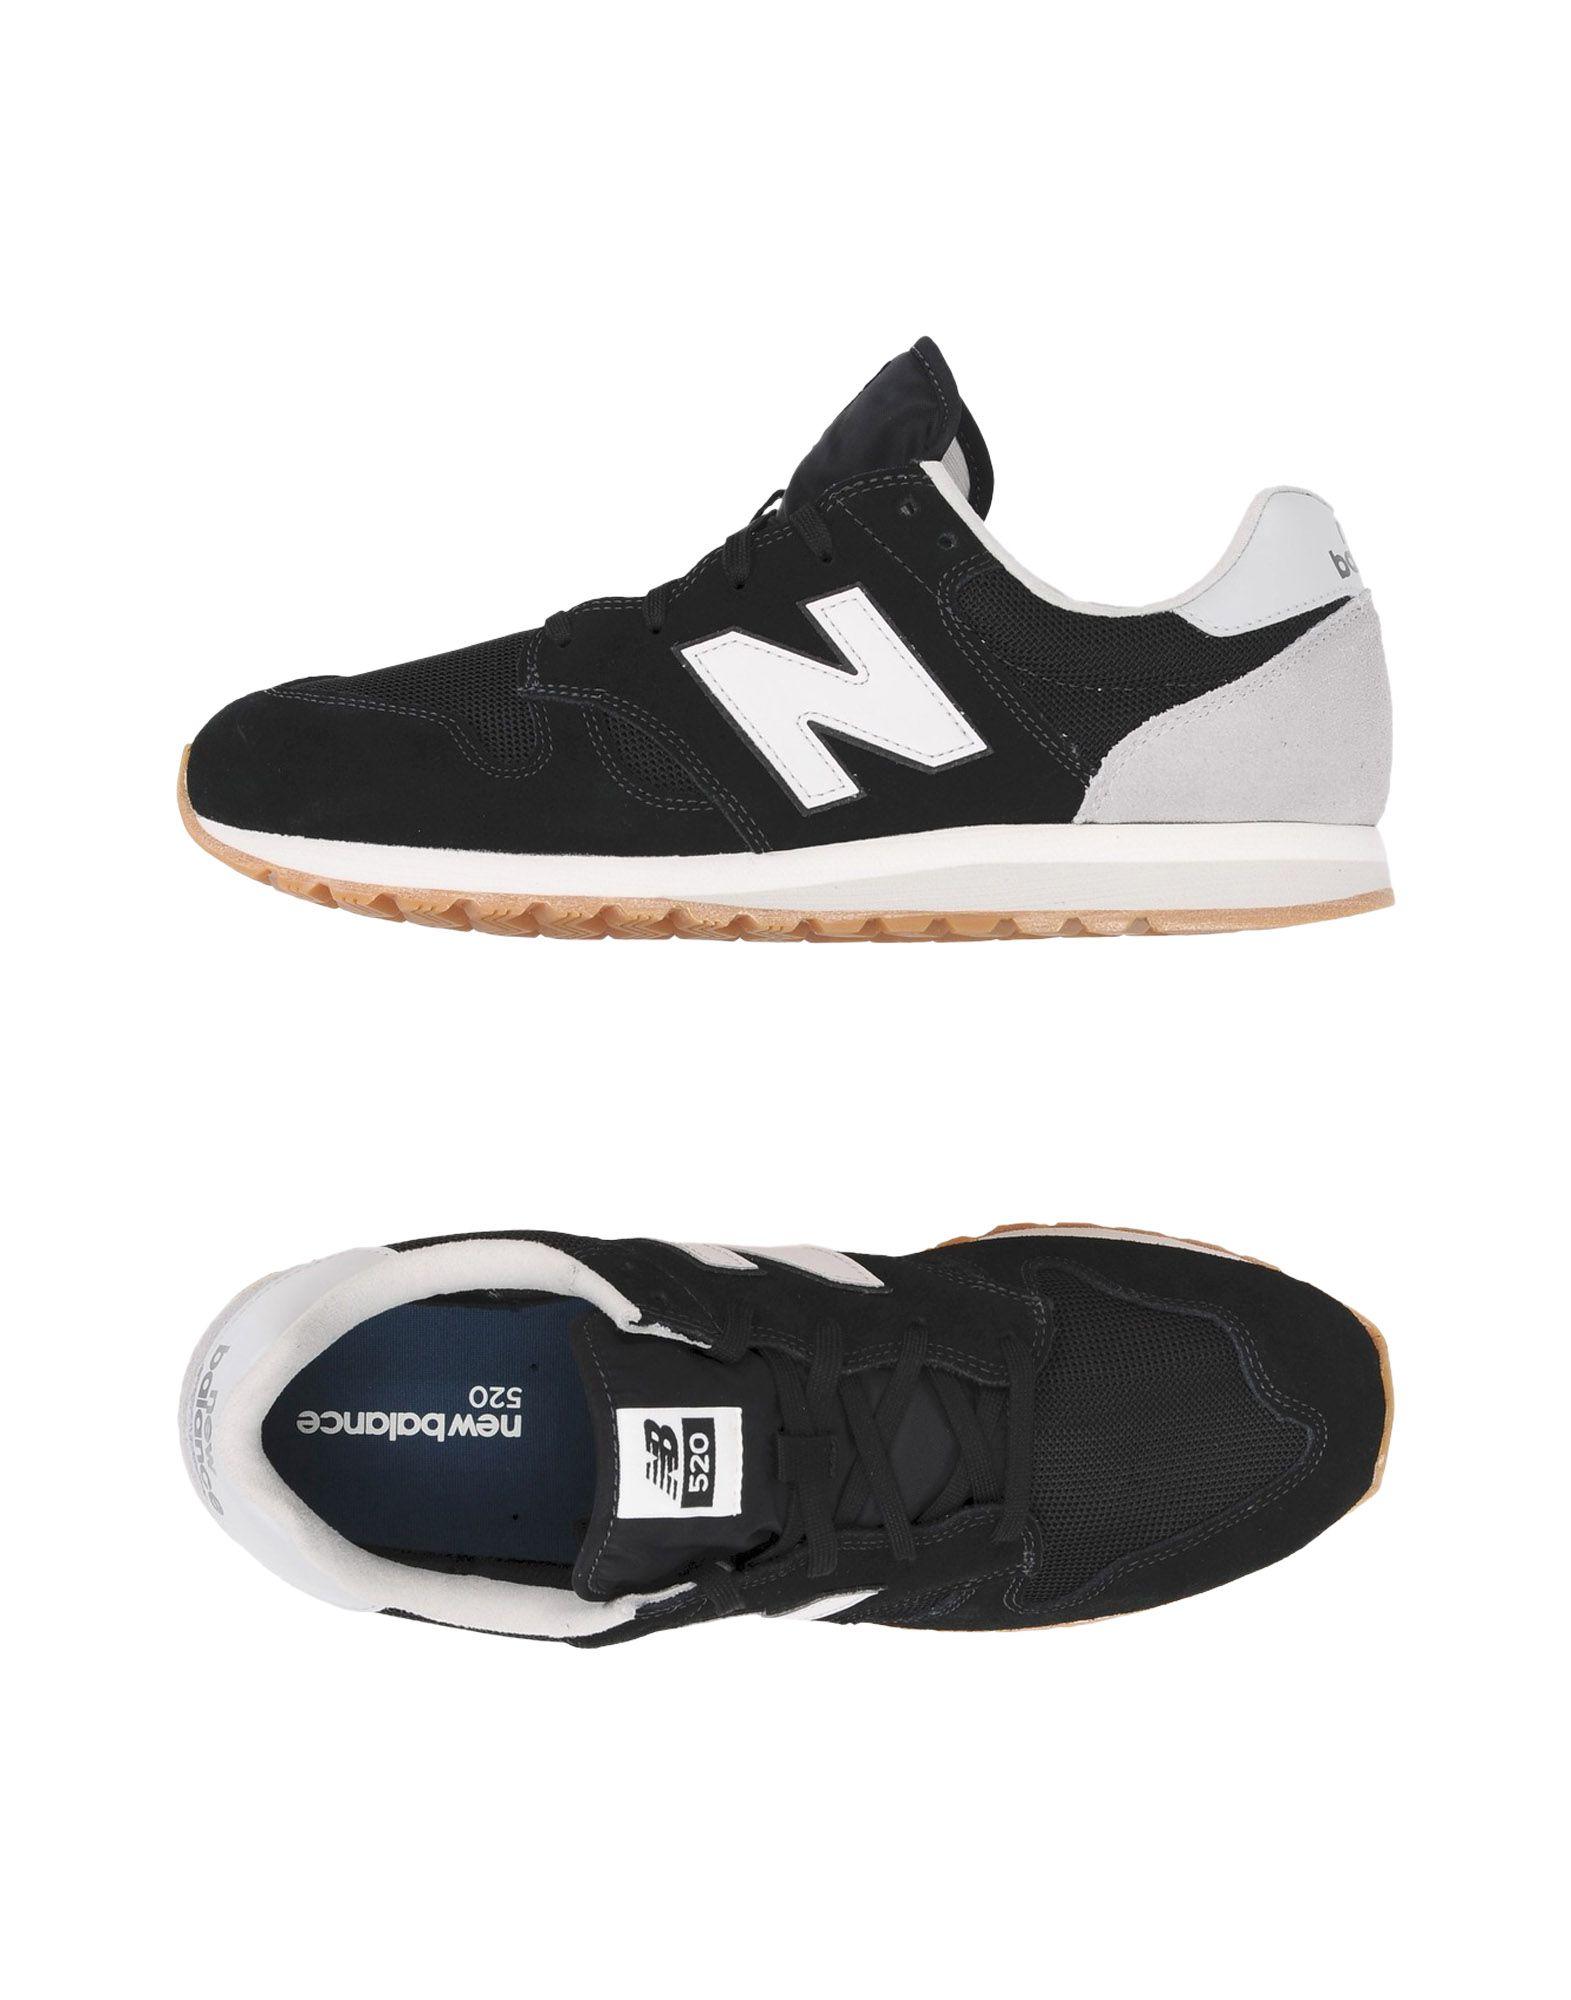 Sneakers New Balance 520 Vintage - Uomo - 11333419KM